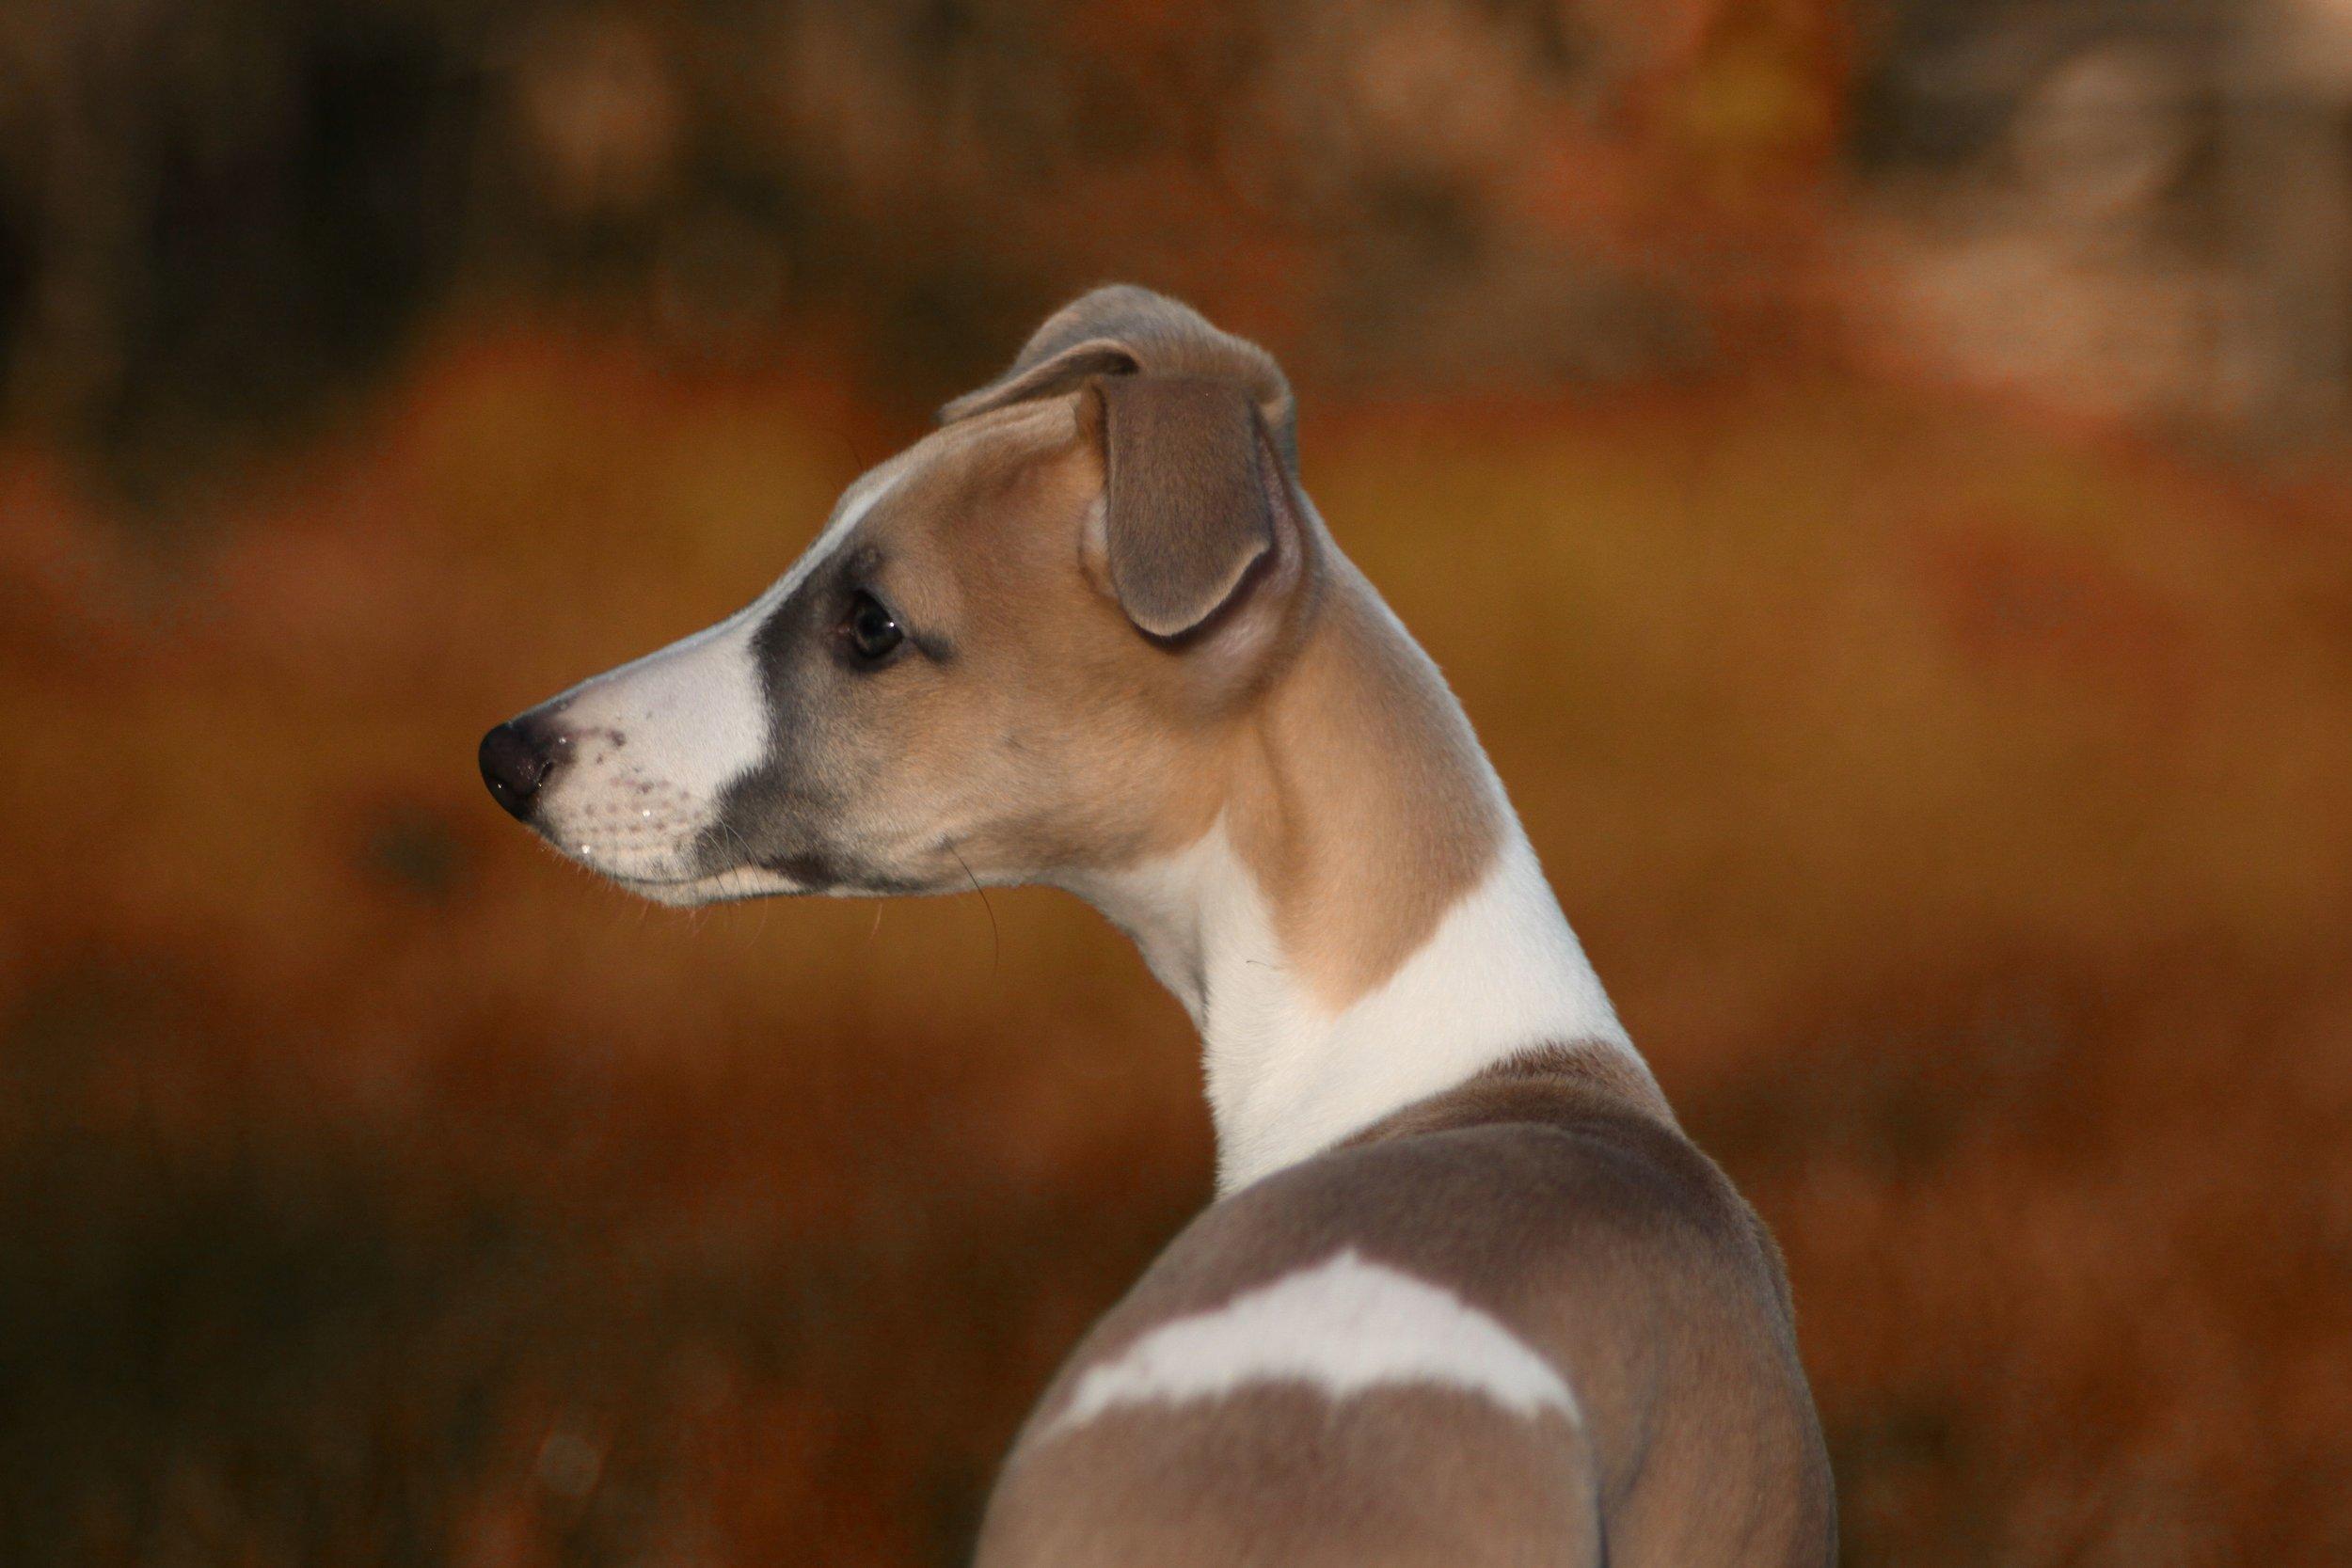 Django aged 12 weeks